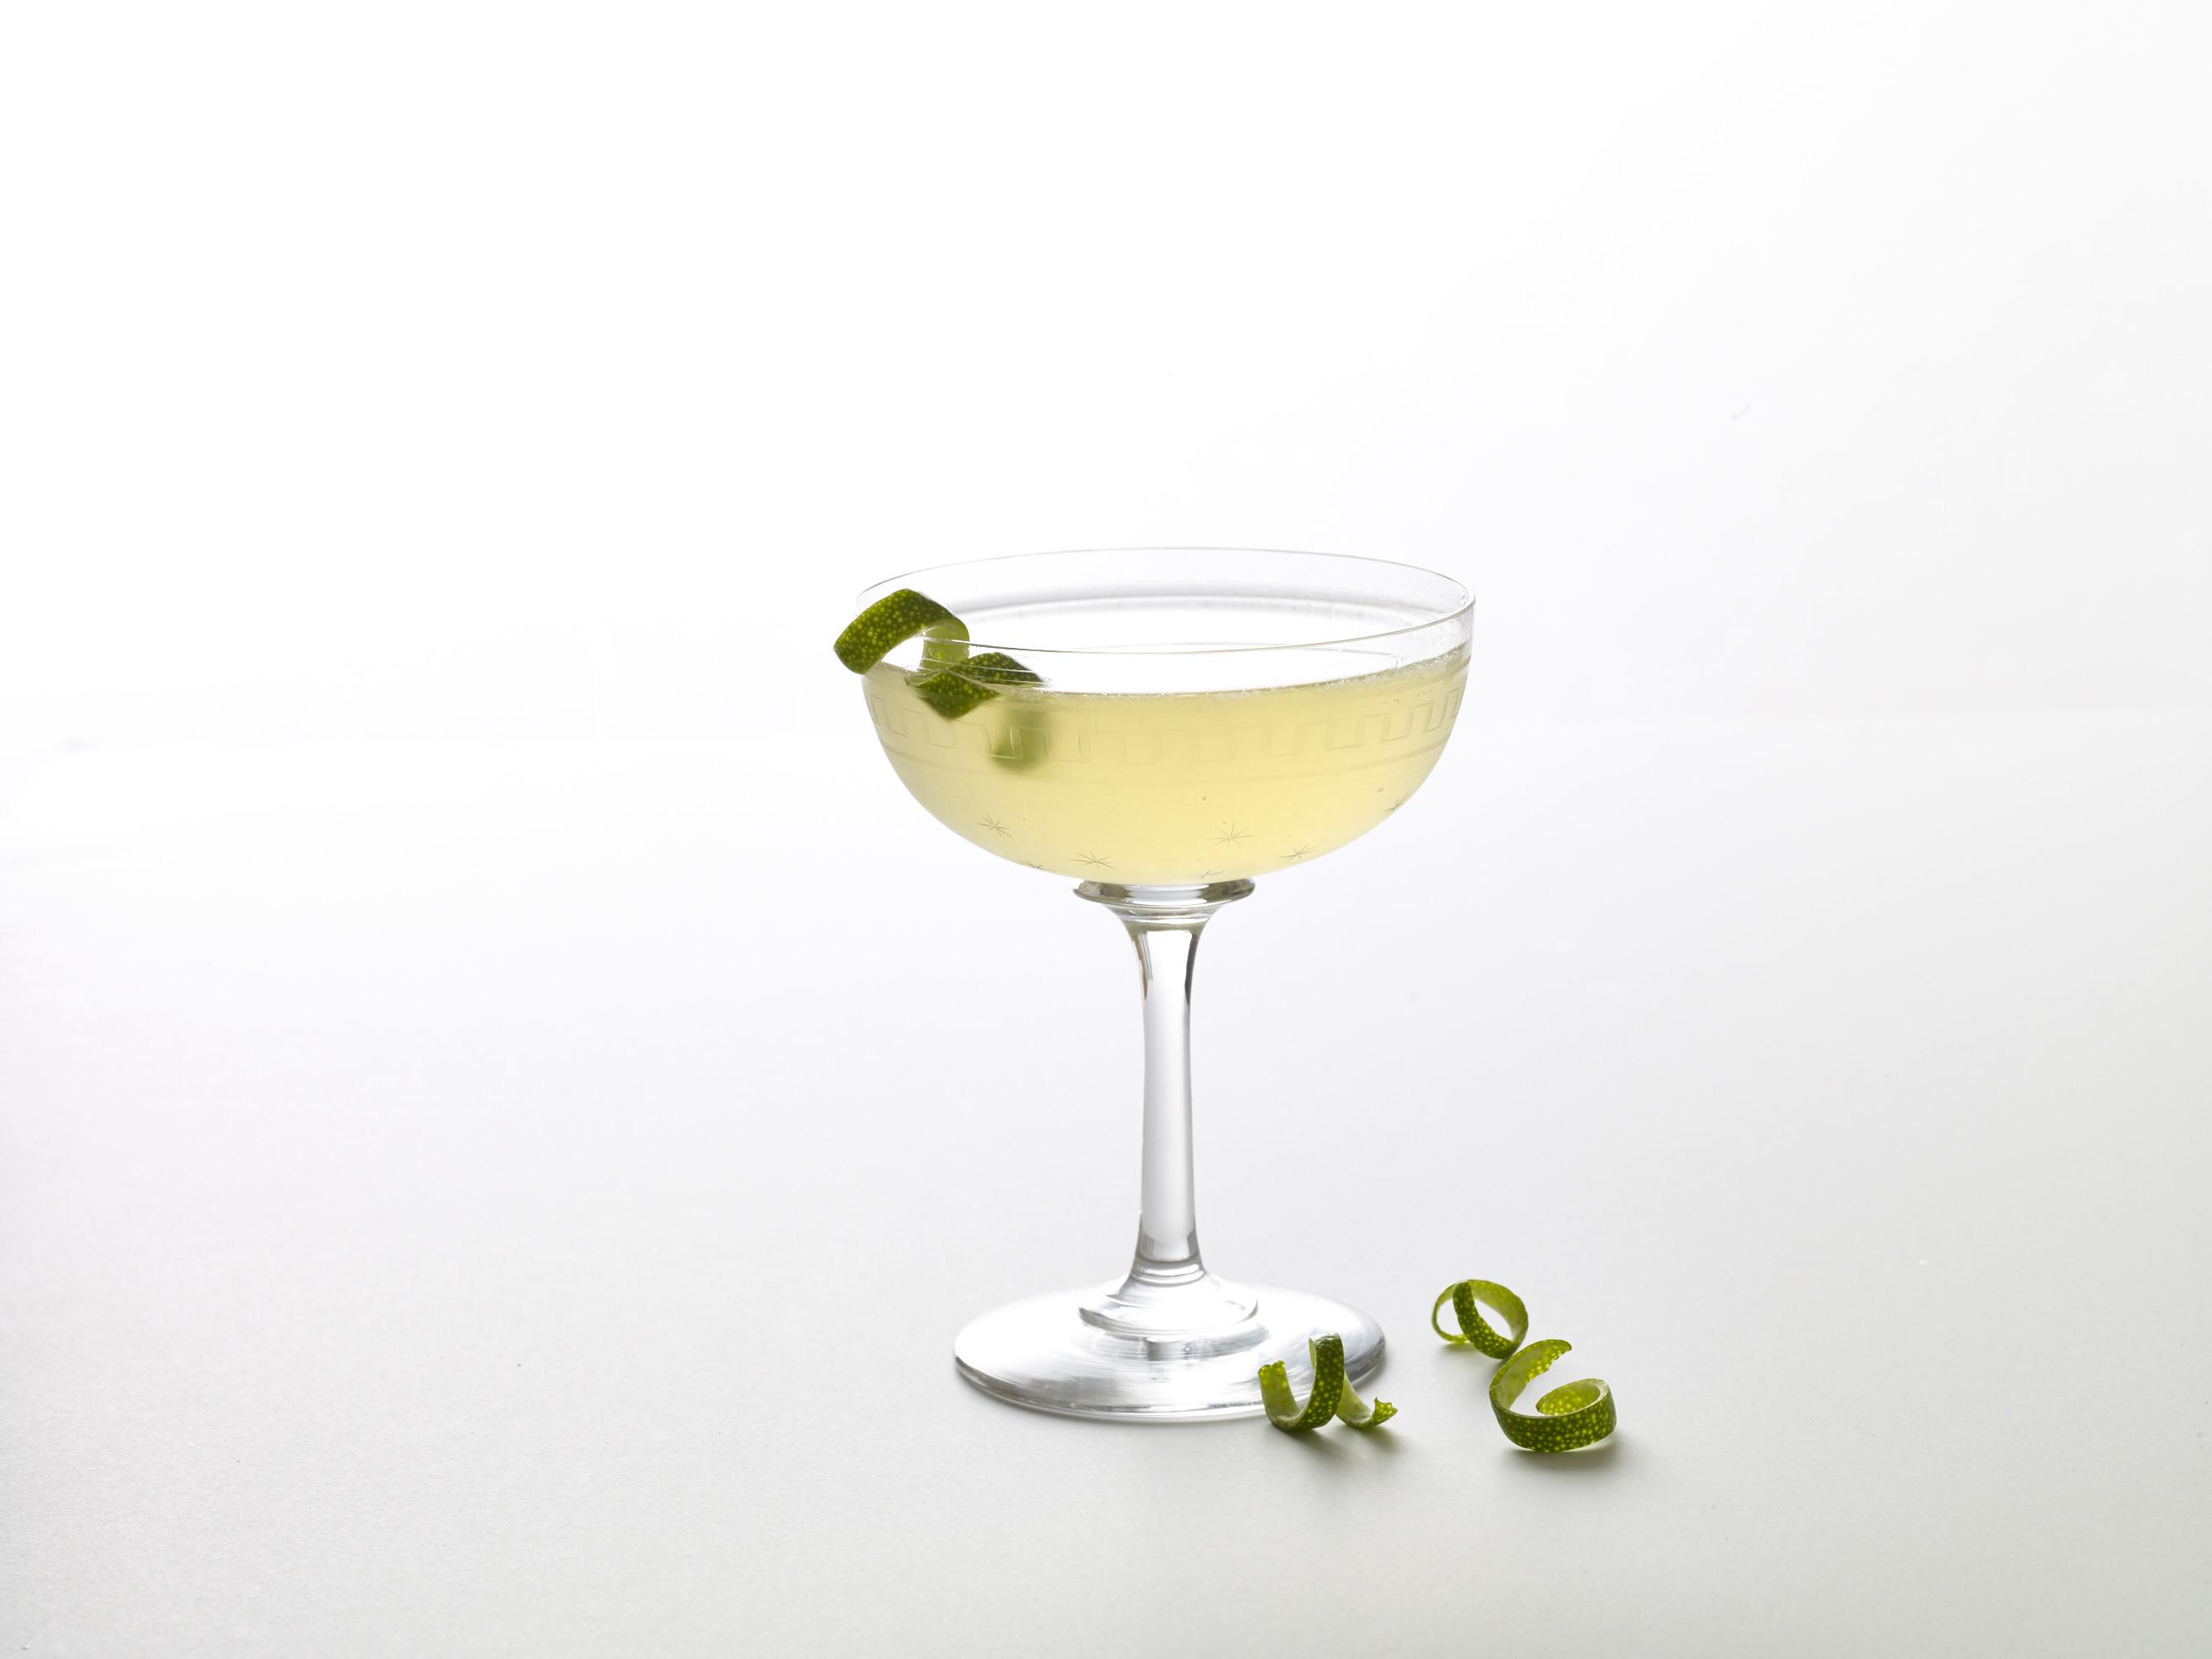 satin sheets cocktail